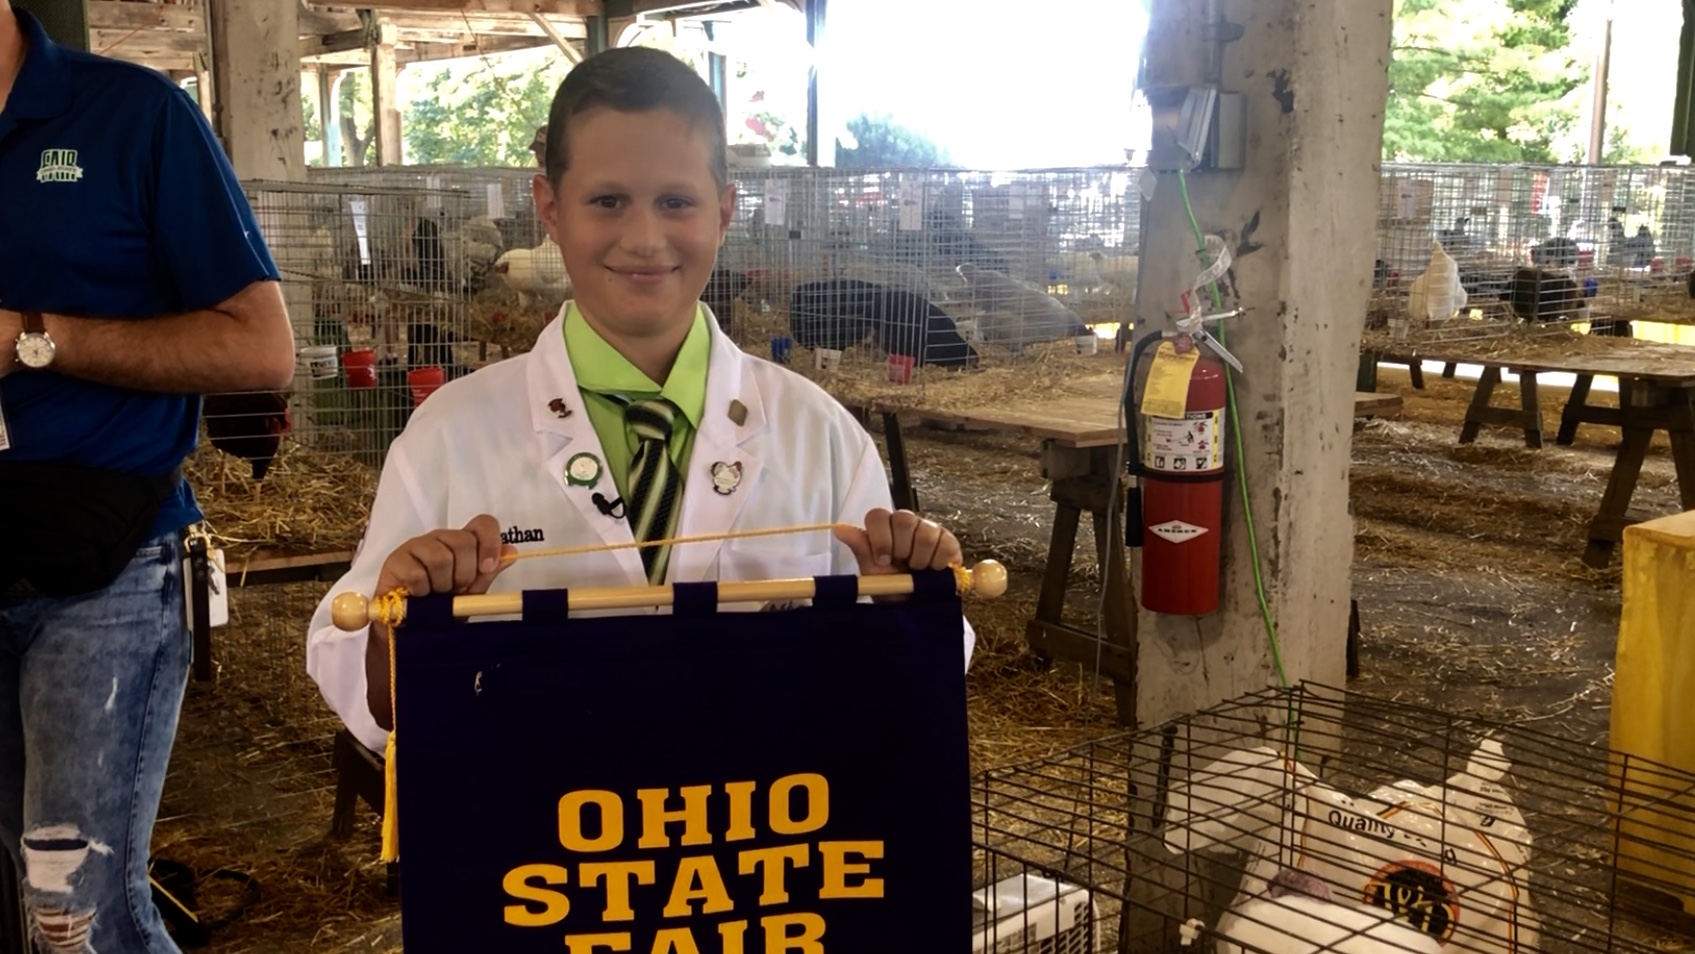 Winning livestock exhibitors excited for Ohio State Fair's